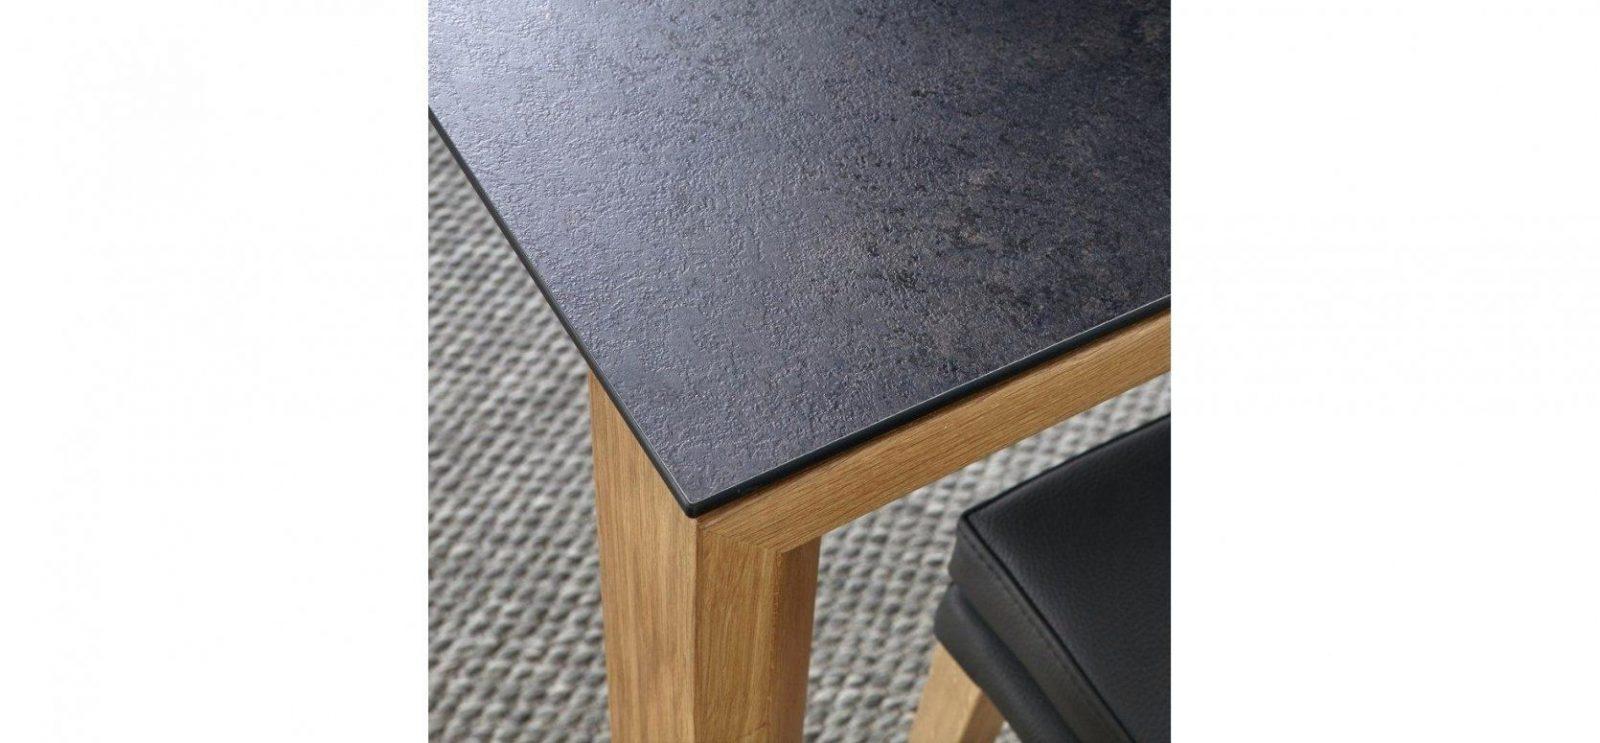 tischplatte nach ma tischplatten aus massivholz direkt. Black Bedroom Furniture Sets. Home Design Ideas